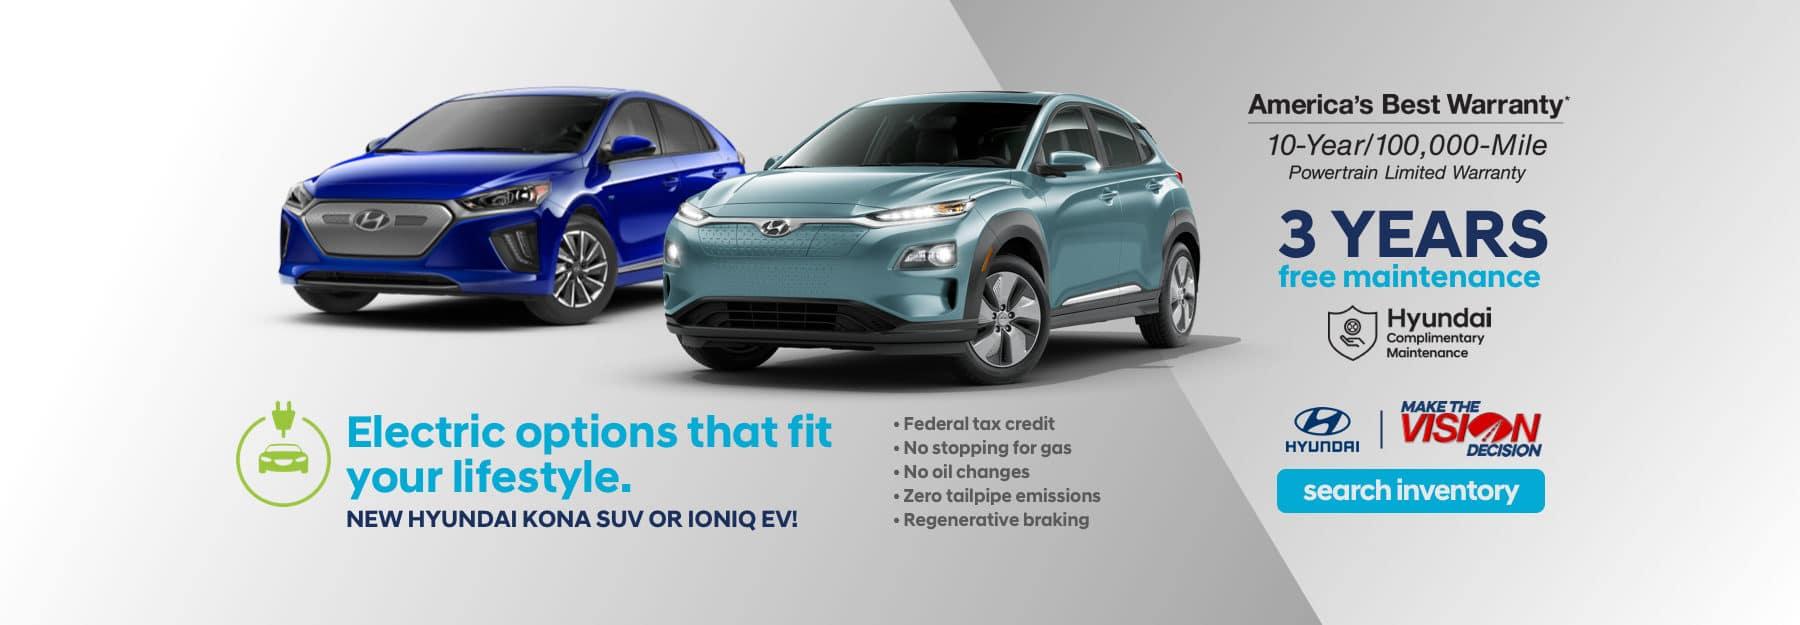 Vision-Hyundai-Sliders-1228-Elect-Car